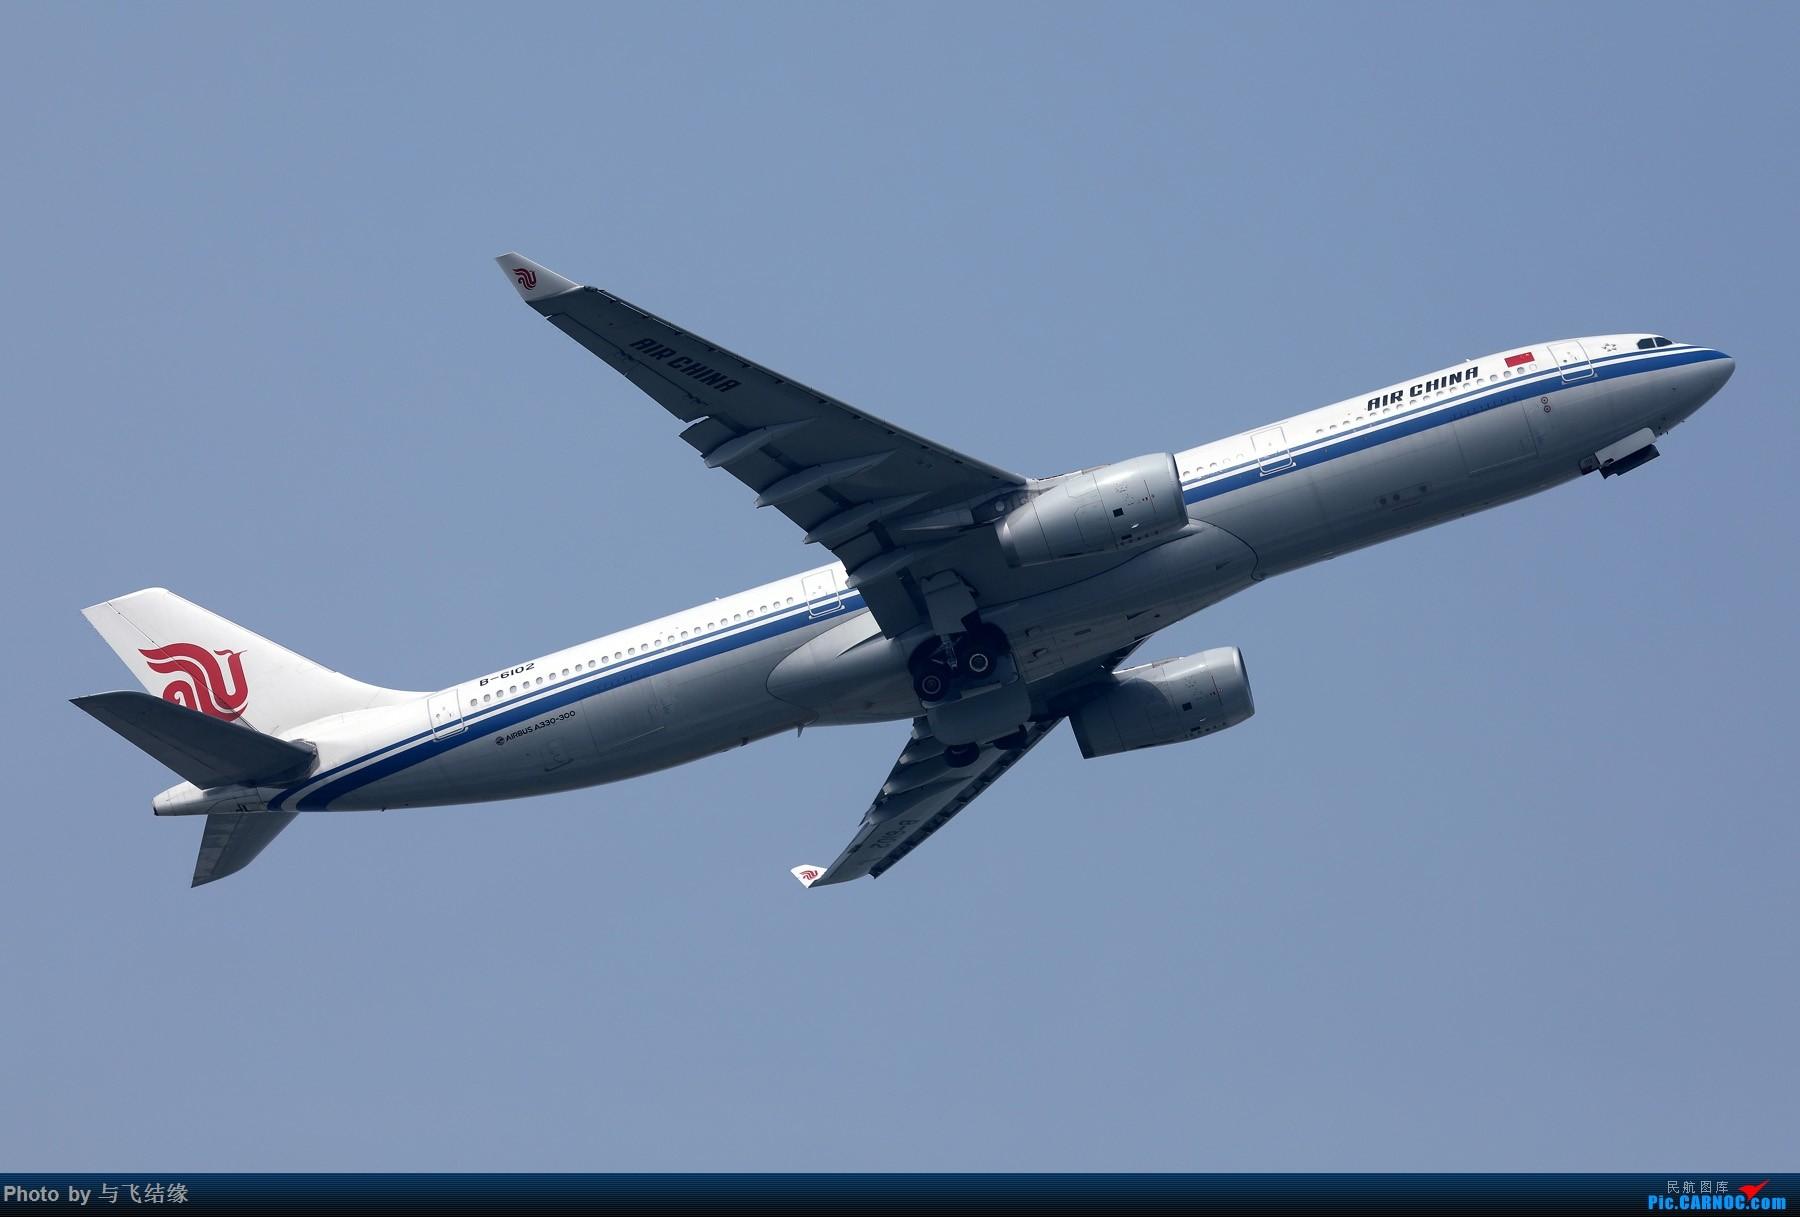 Re:[原创]周末发图一组中外混搭组合! AIRBUS A330-300 B-6102 中国北京首都国际机场